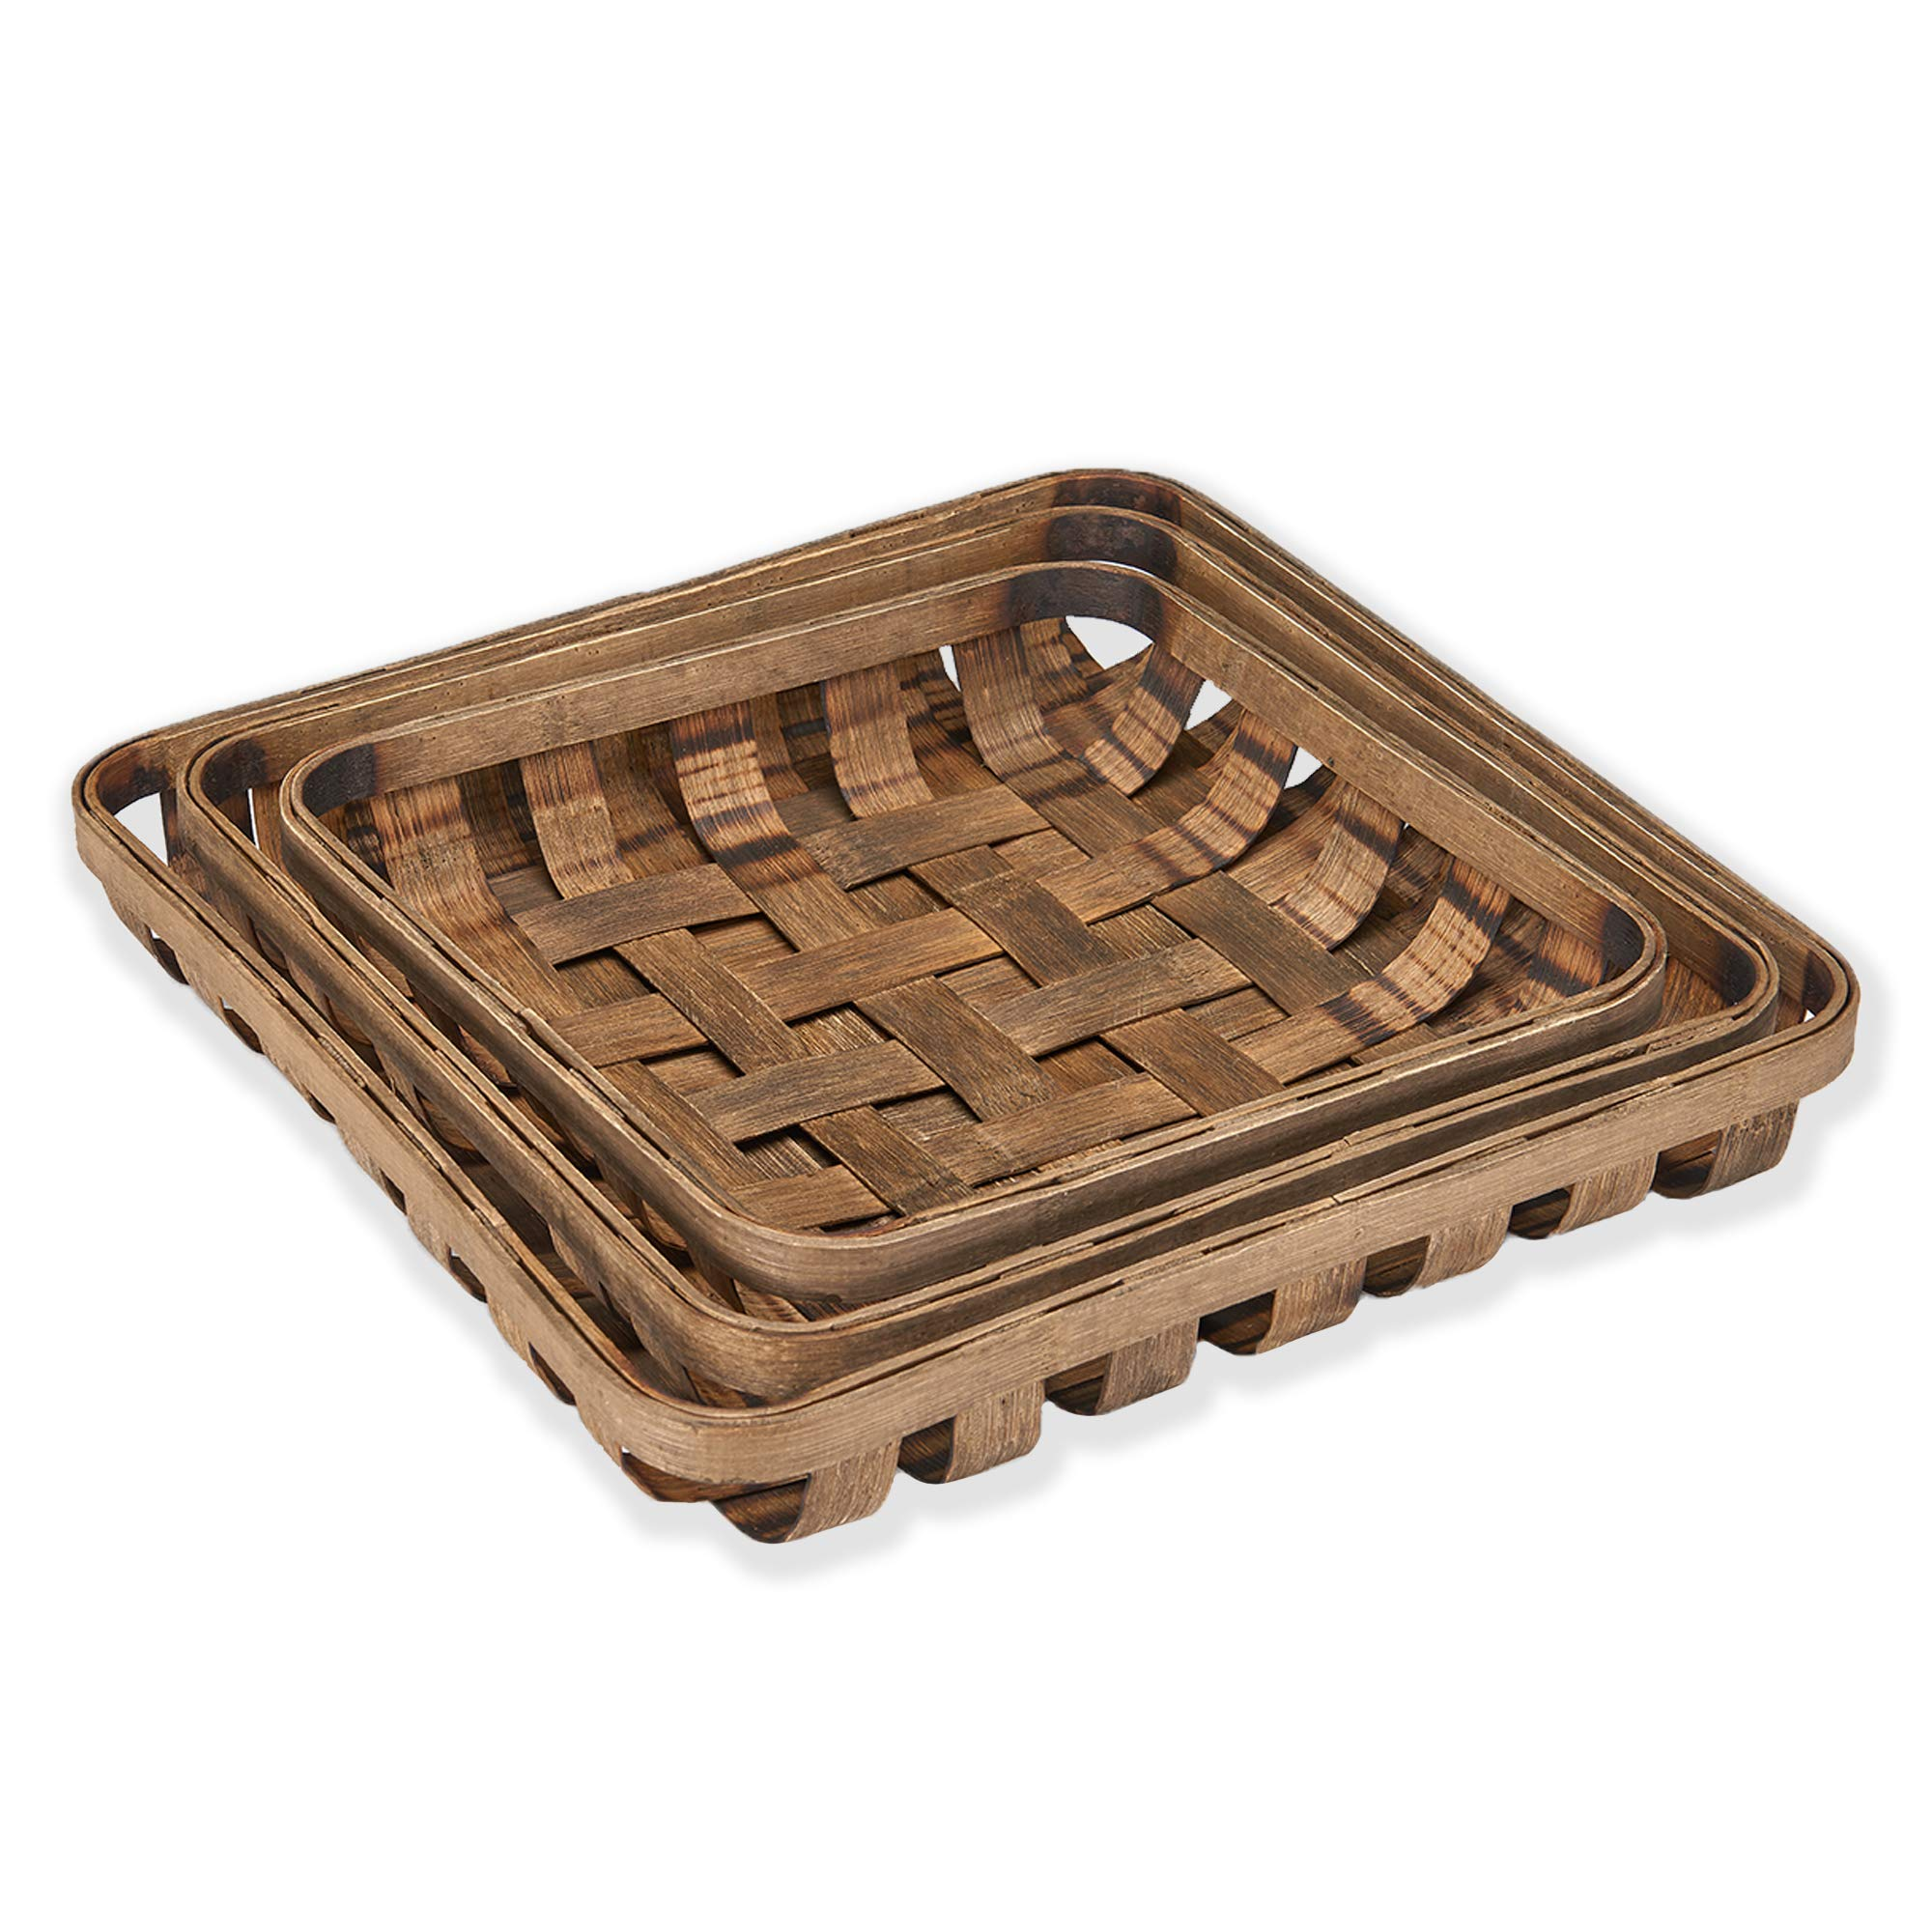 Barnyard Designs Tobacco Baskets Rustic Vintage Farmhouse Nesting Trays, Set of 3 by Barnyard Designs